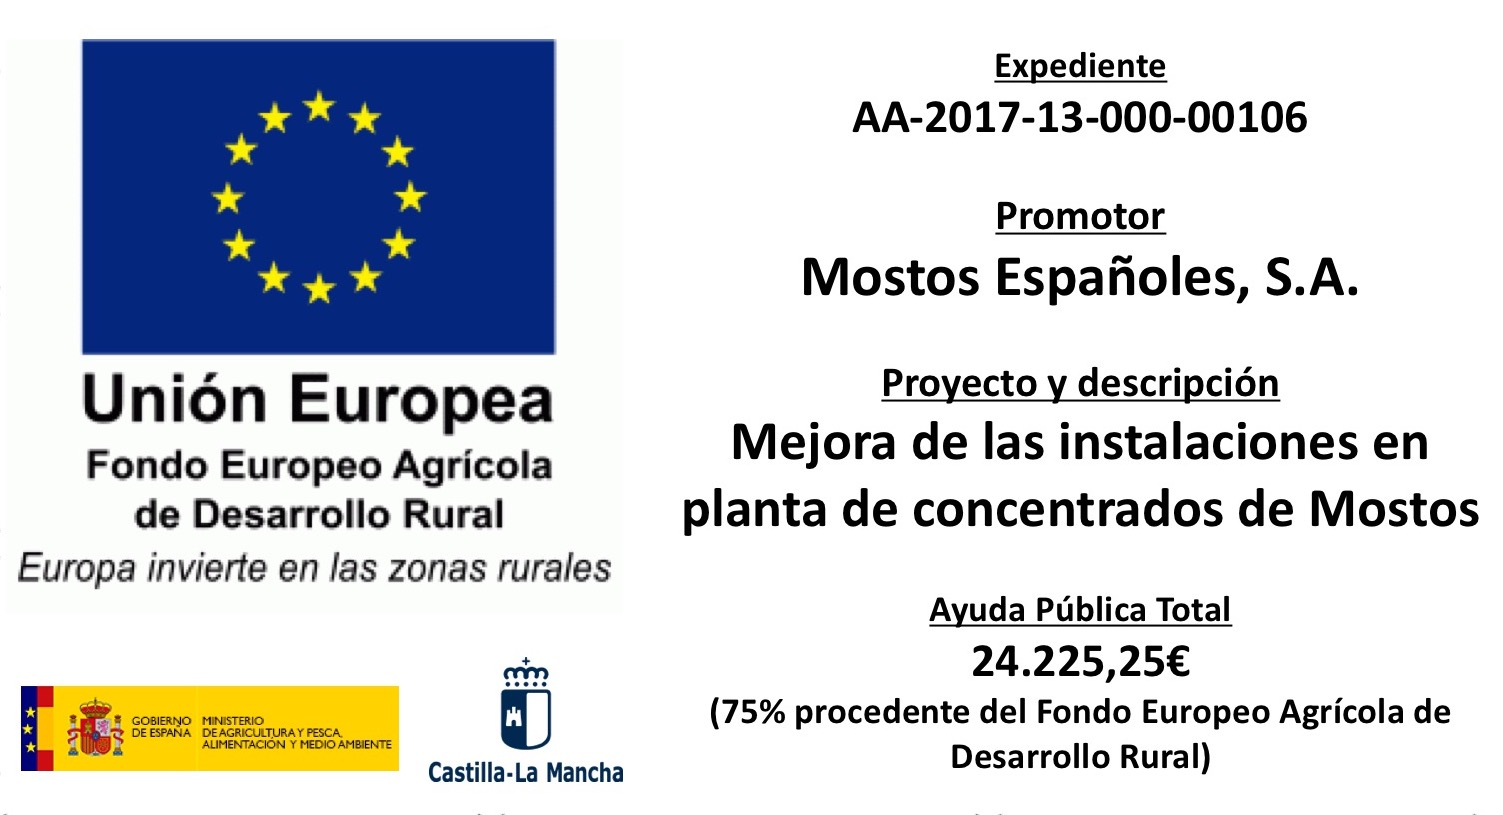 FOCAL MOSTOS ESPAÑOLES, 2014-2020